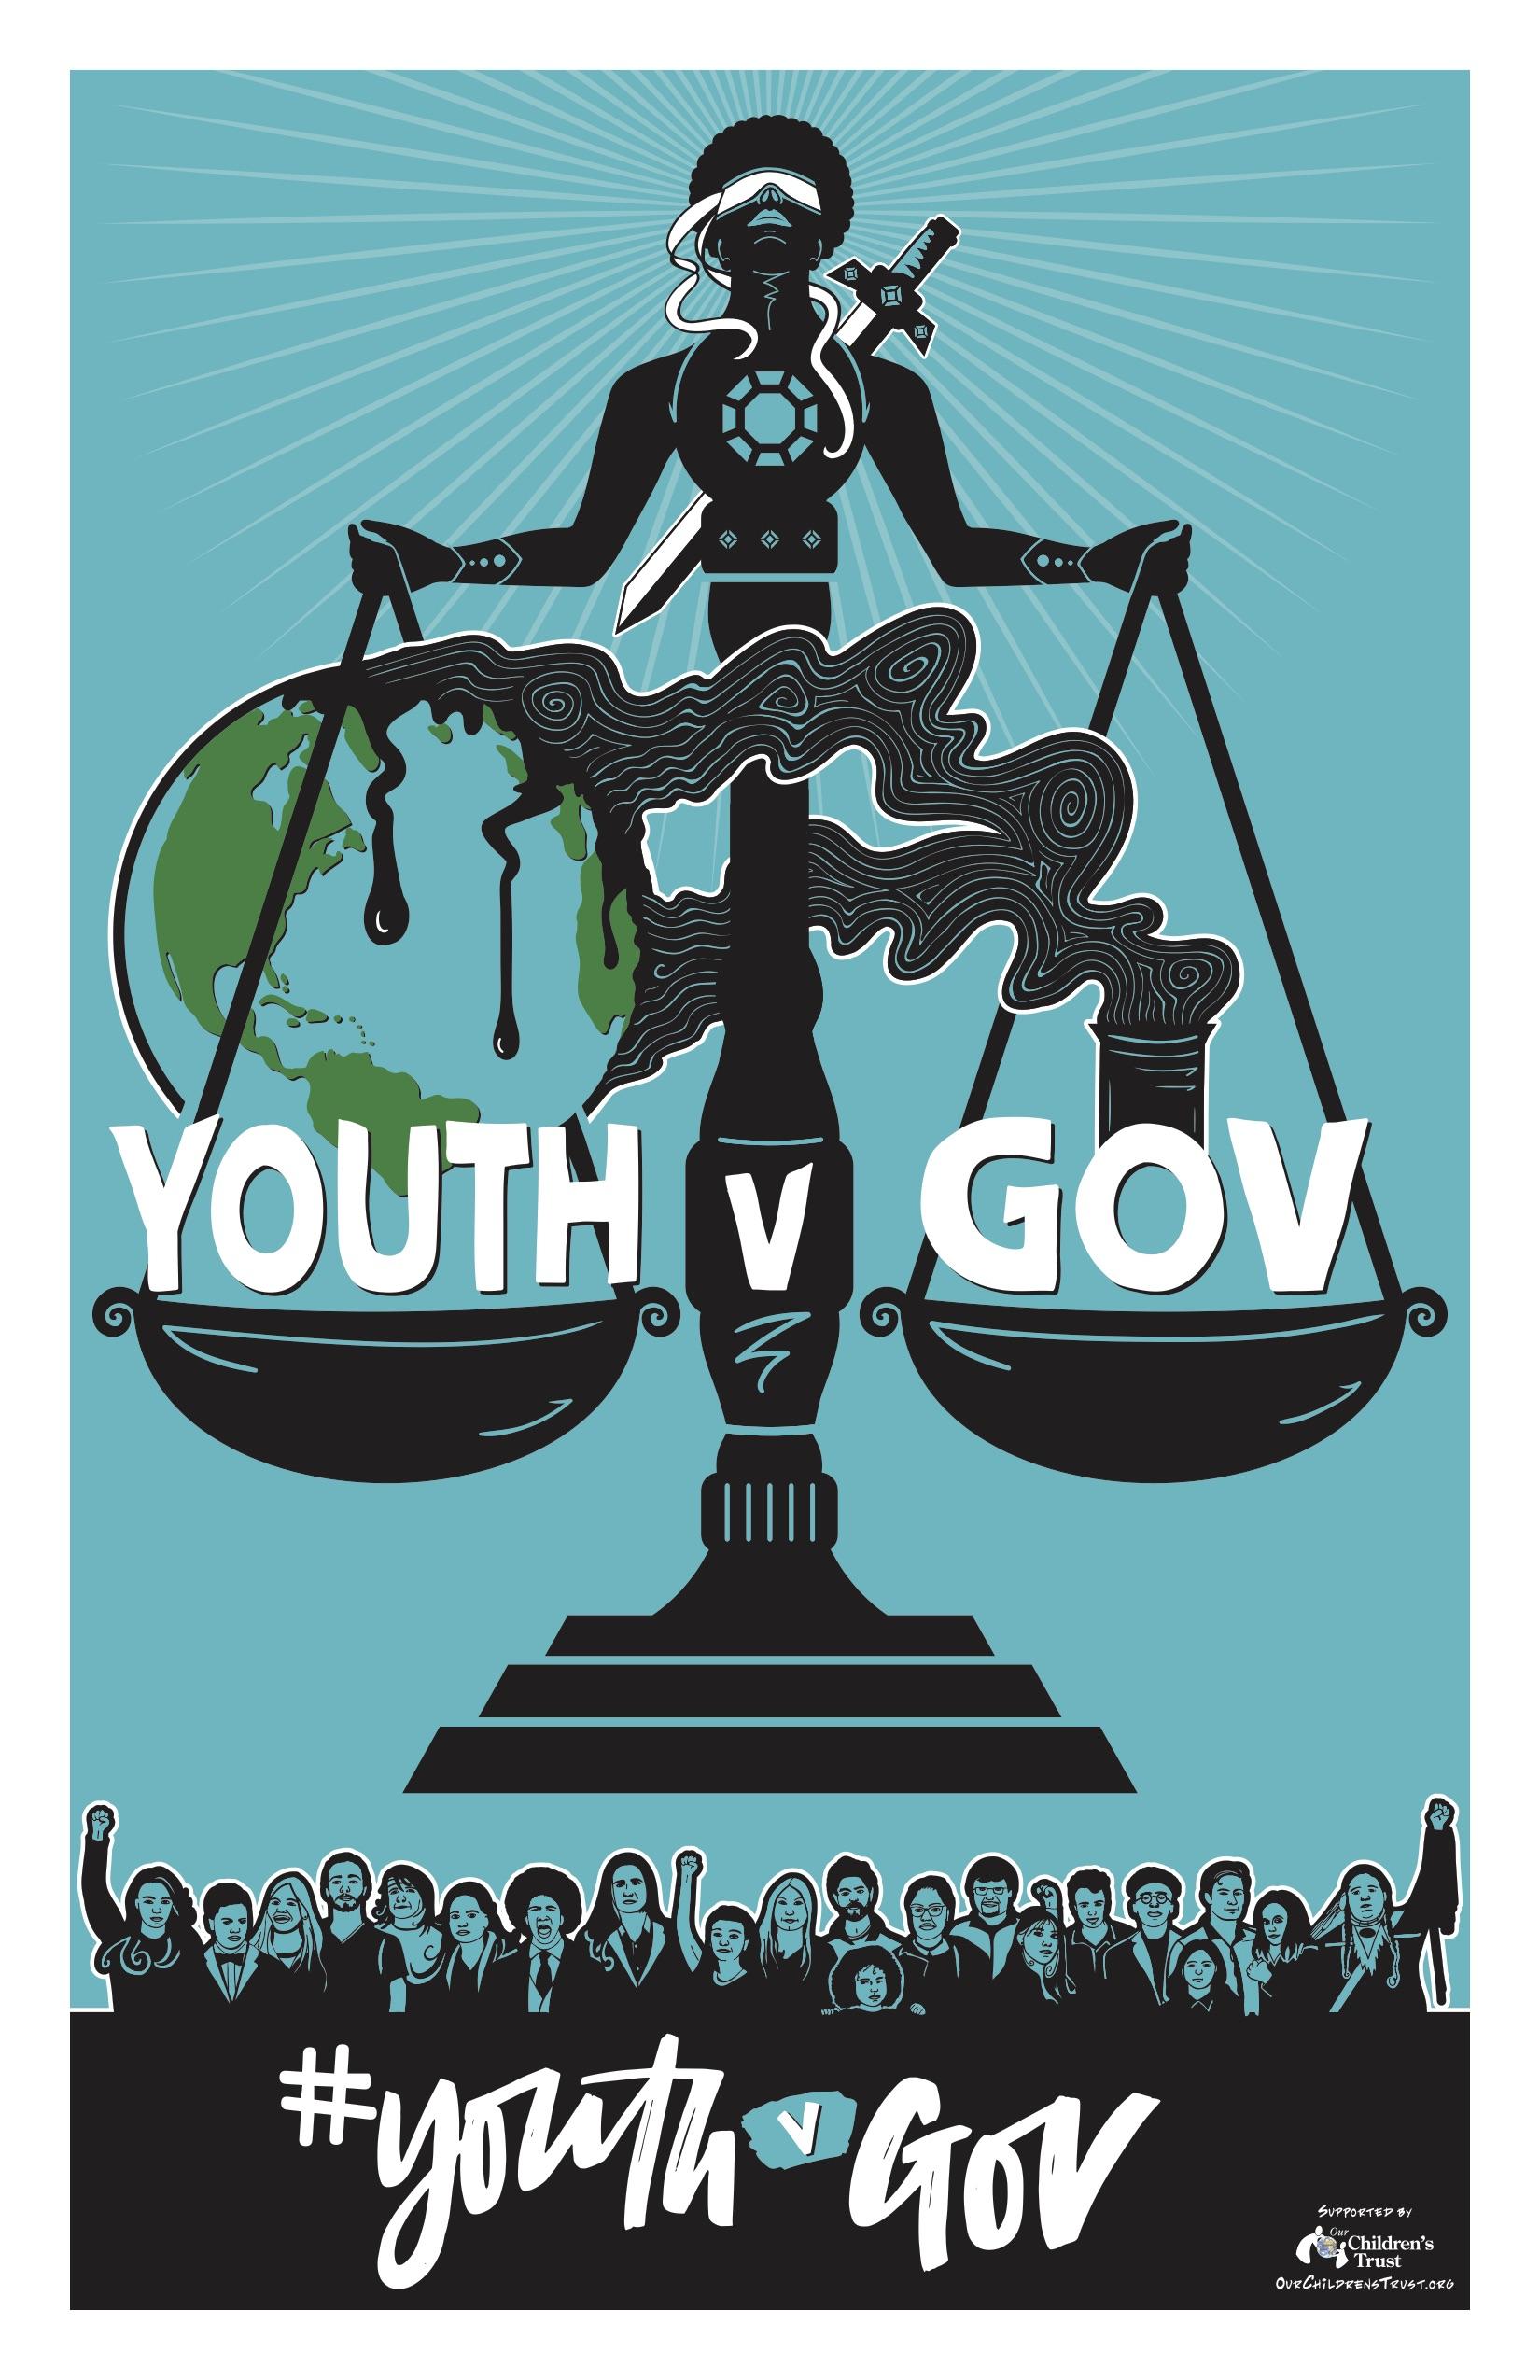 OCT_YouthVGov_ScalesofJustice_final copy.jpg